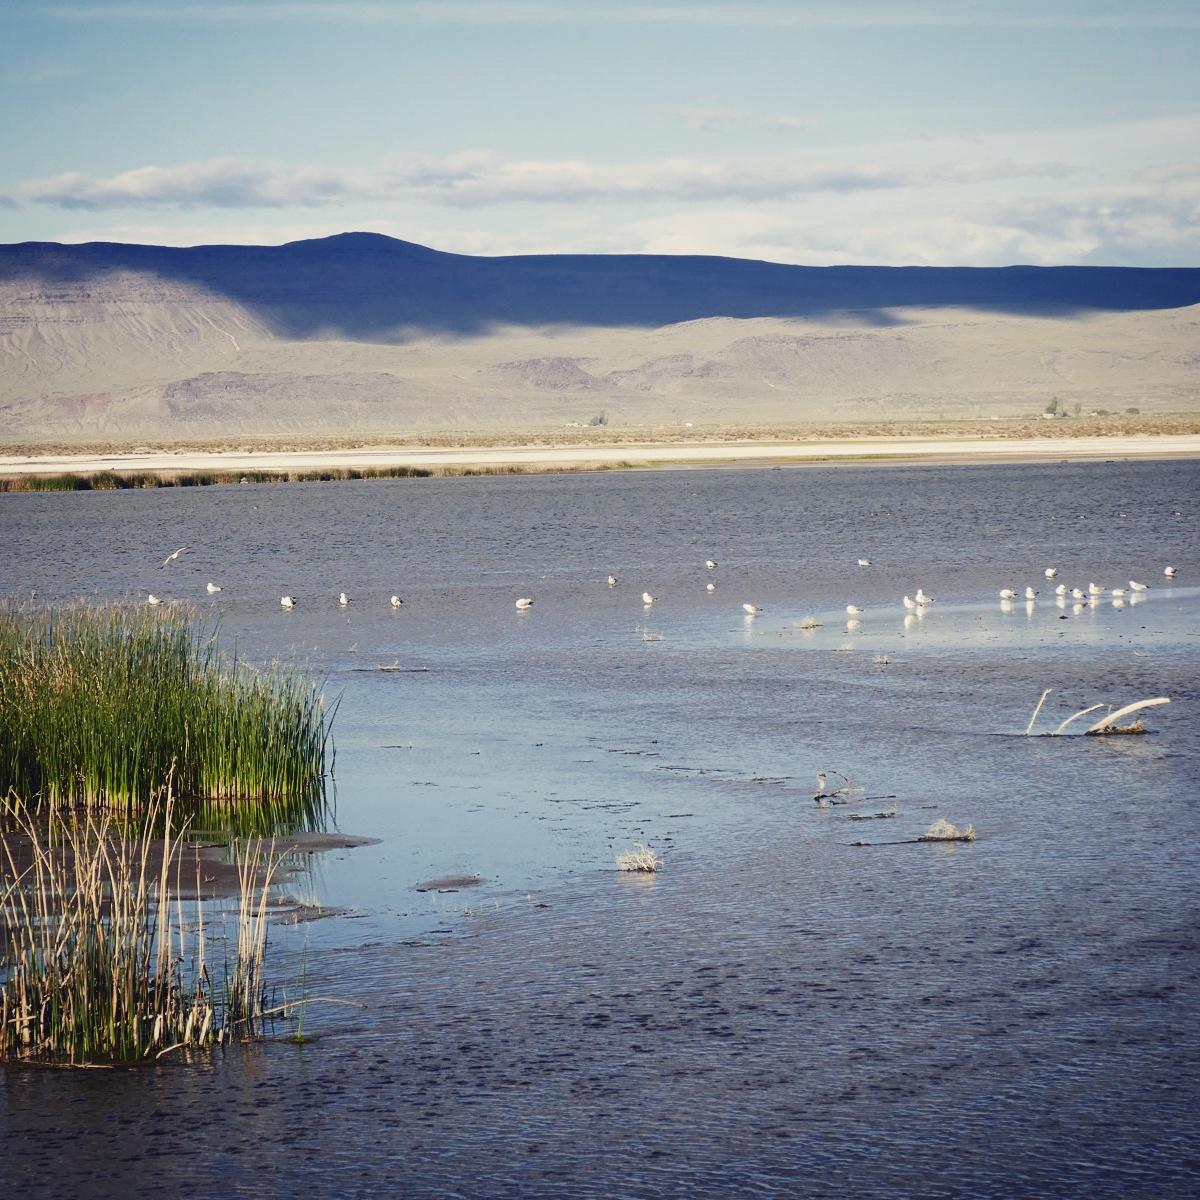 Summer Lake, in eastern Oregon, is an oasis for birds in the desert. Noah Strycker